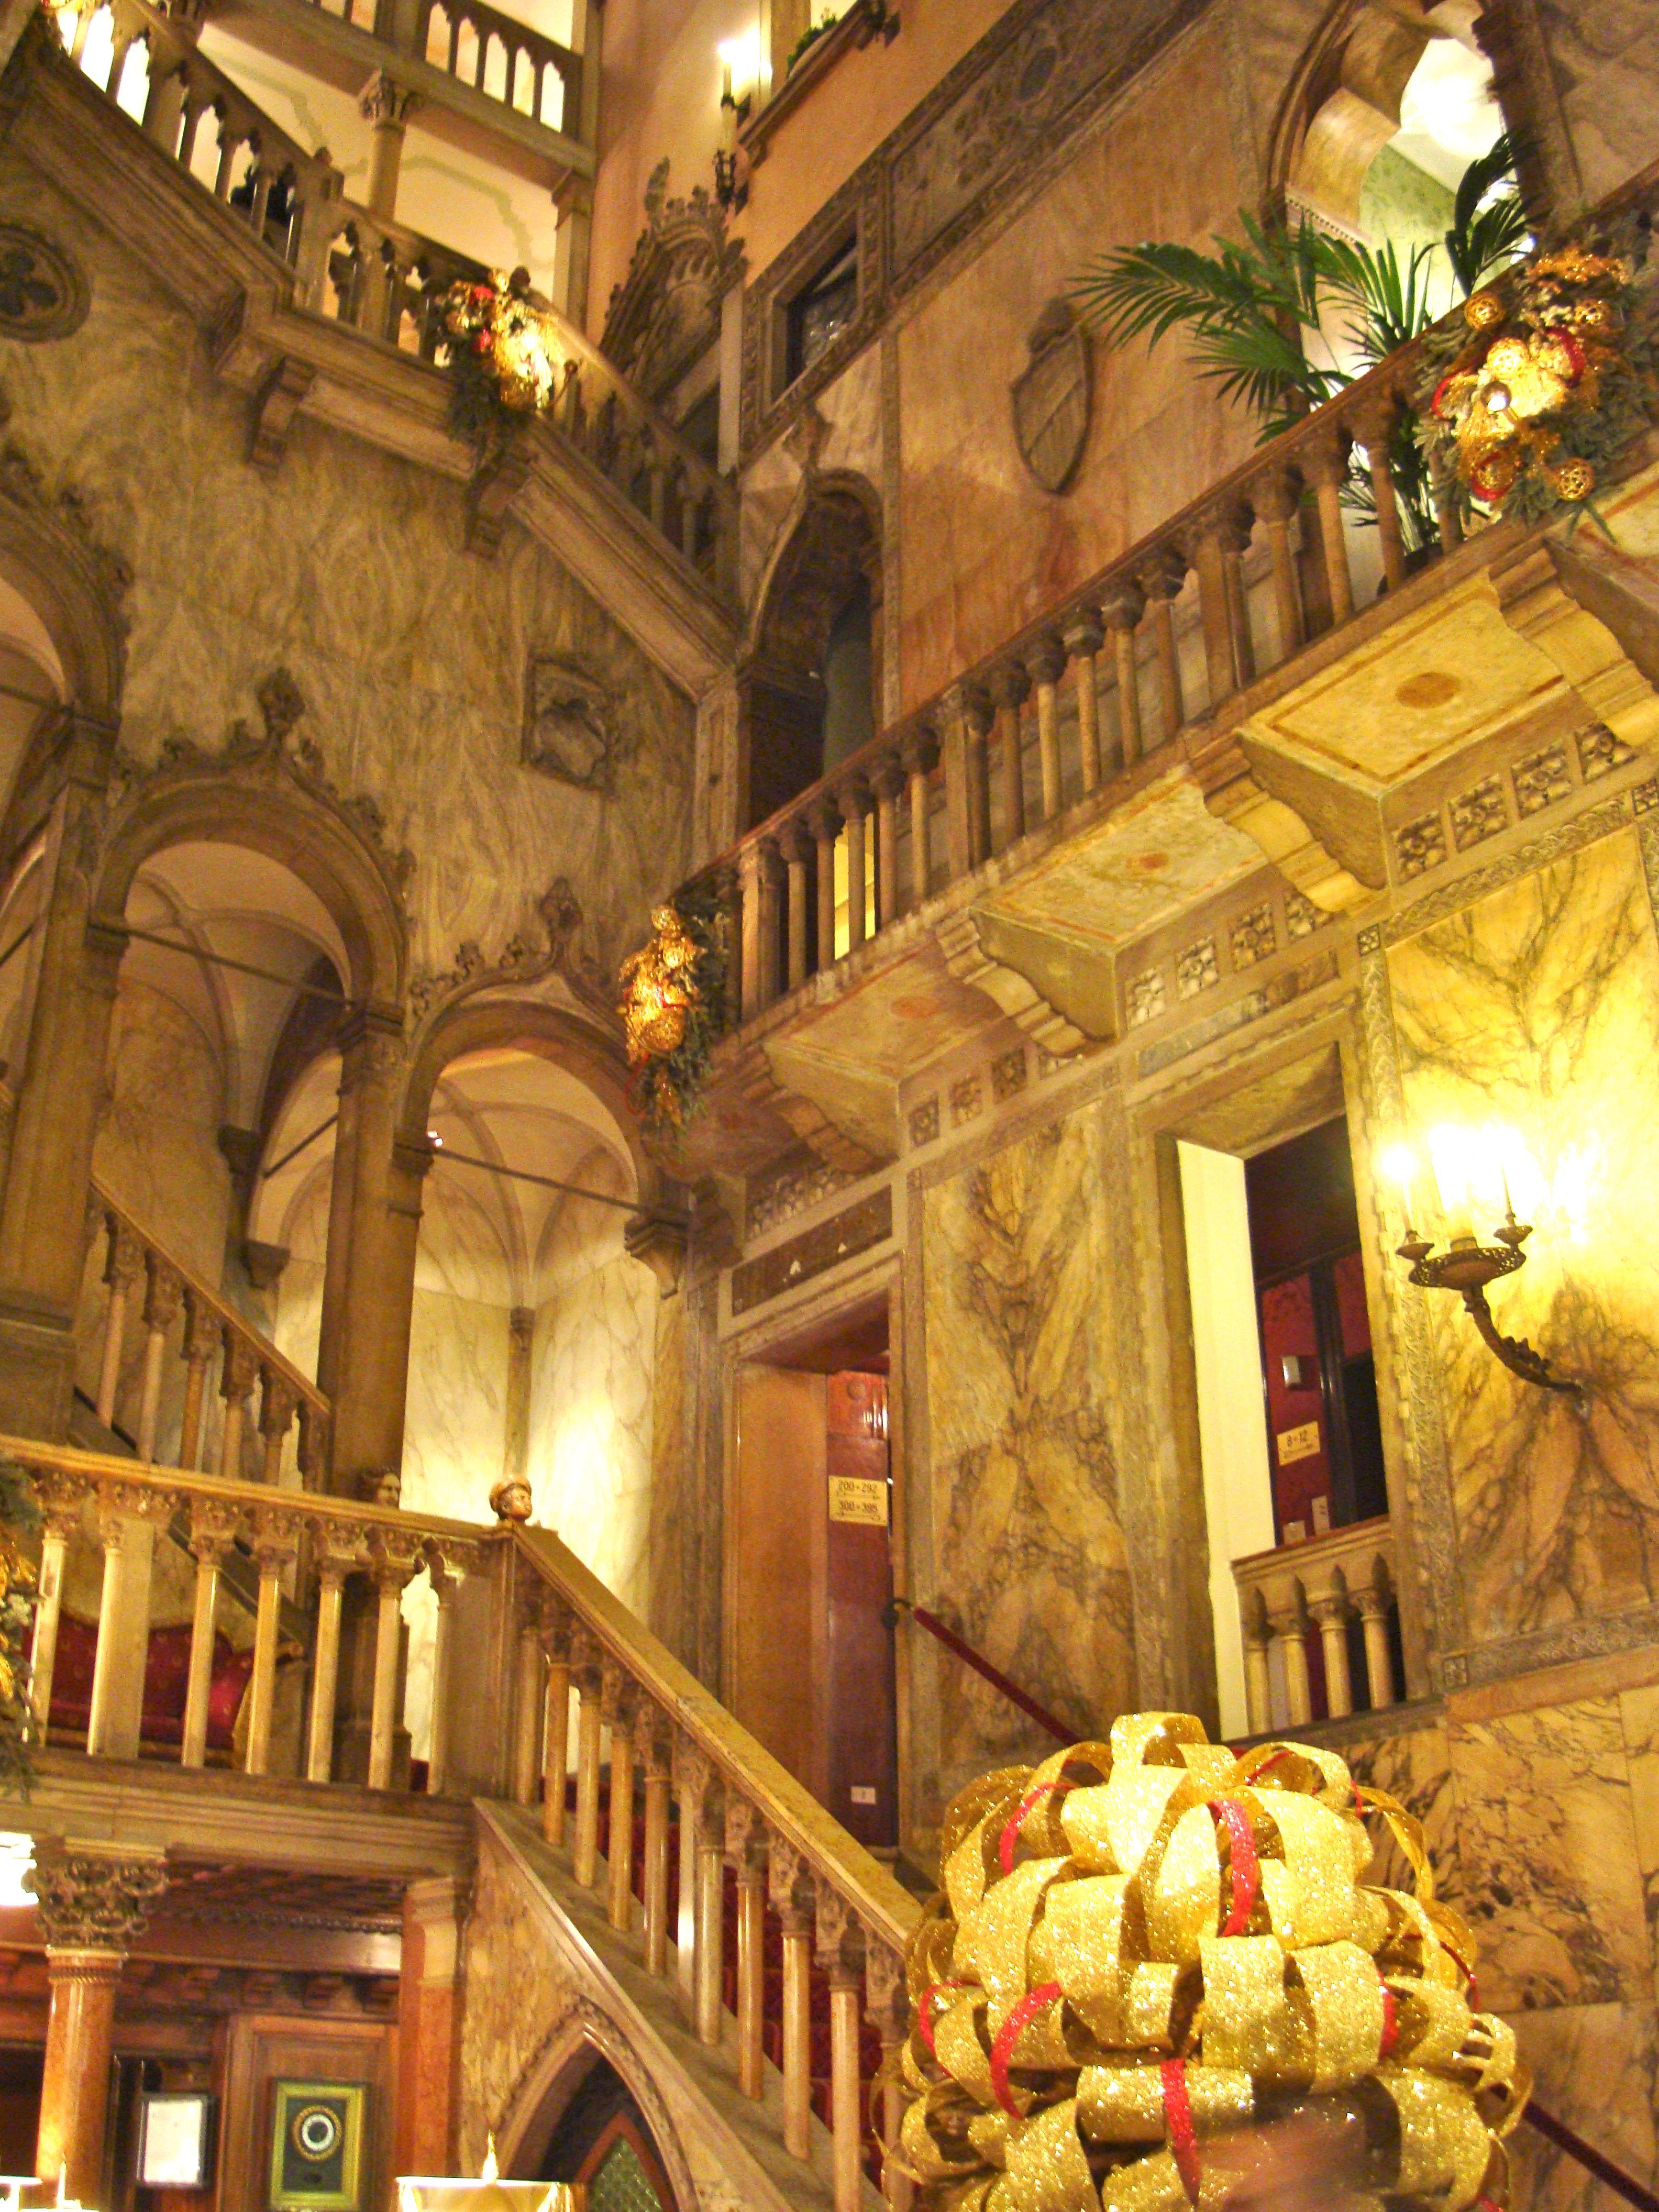 Inside the Hotel Danieli, Venice Italy (Venezia, Italia